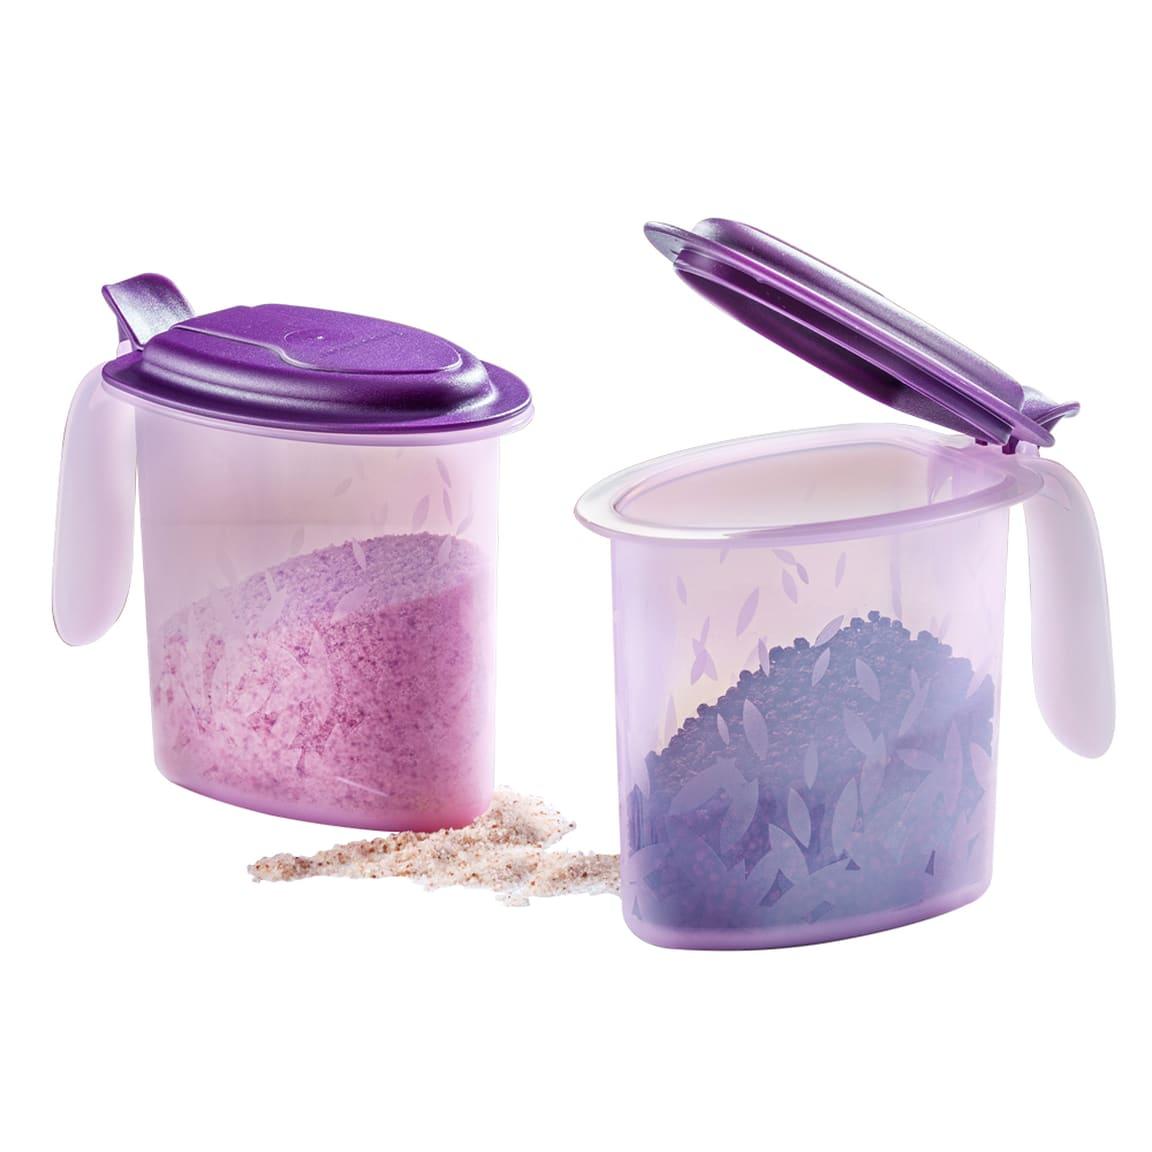 Salt N Spice set (2) 500ml